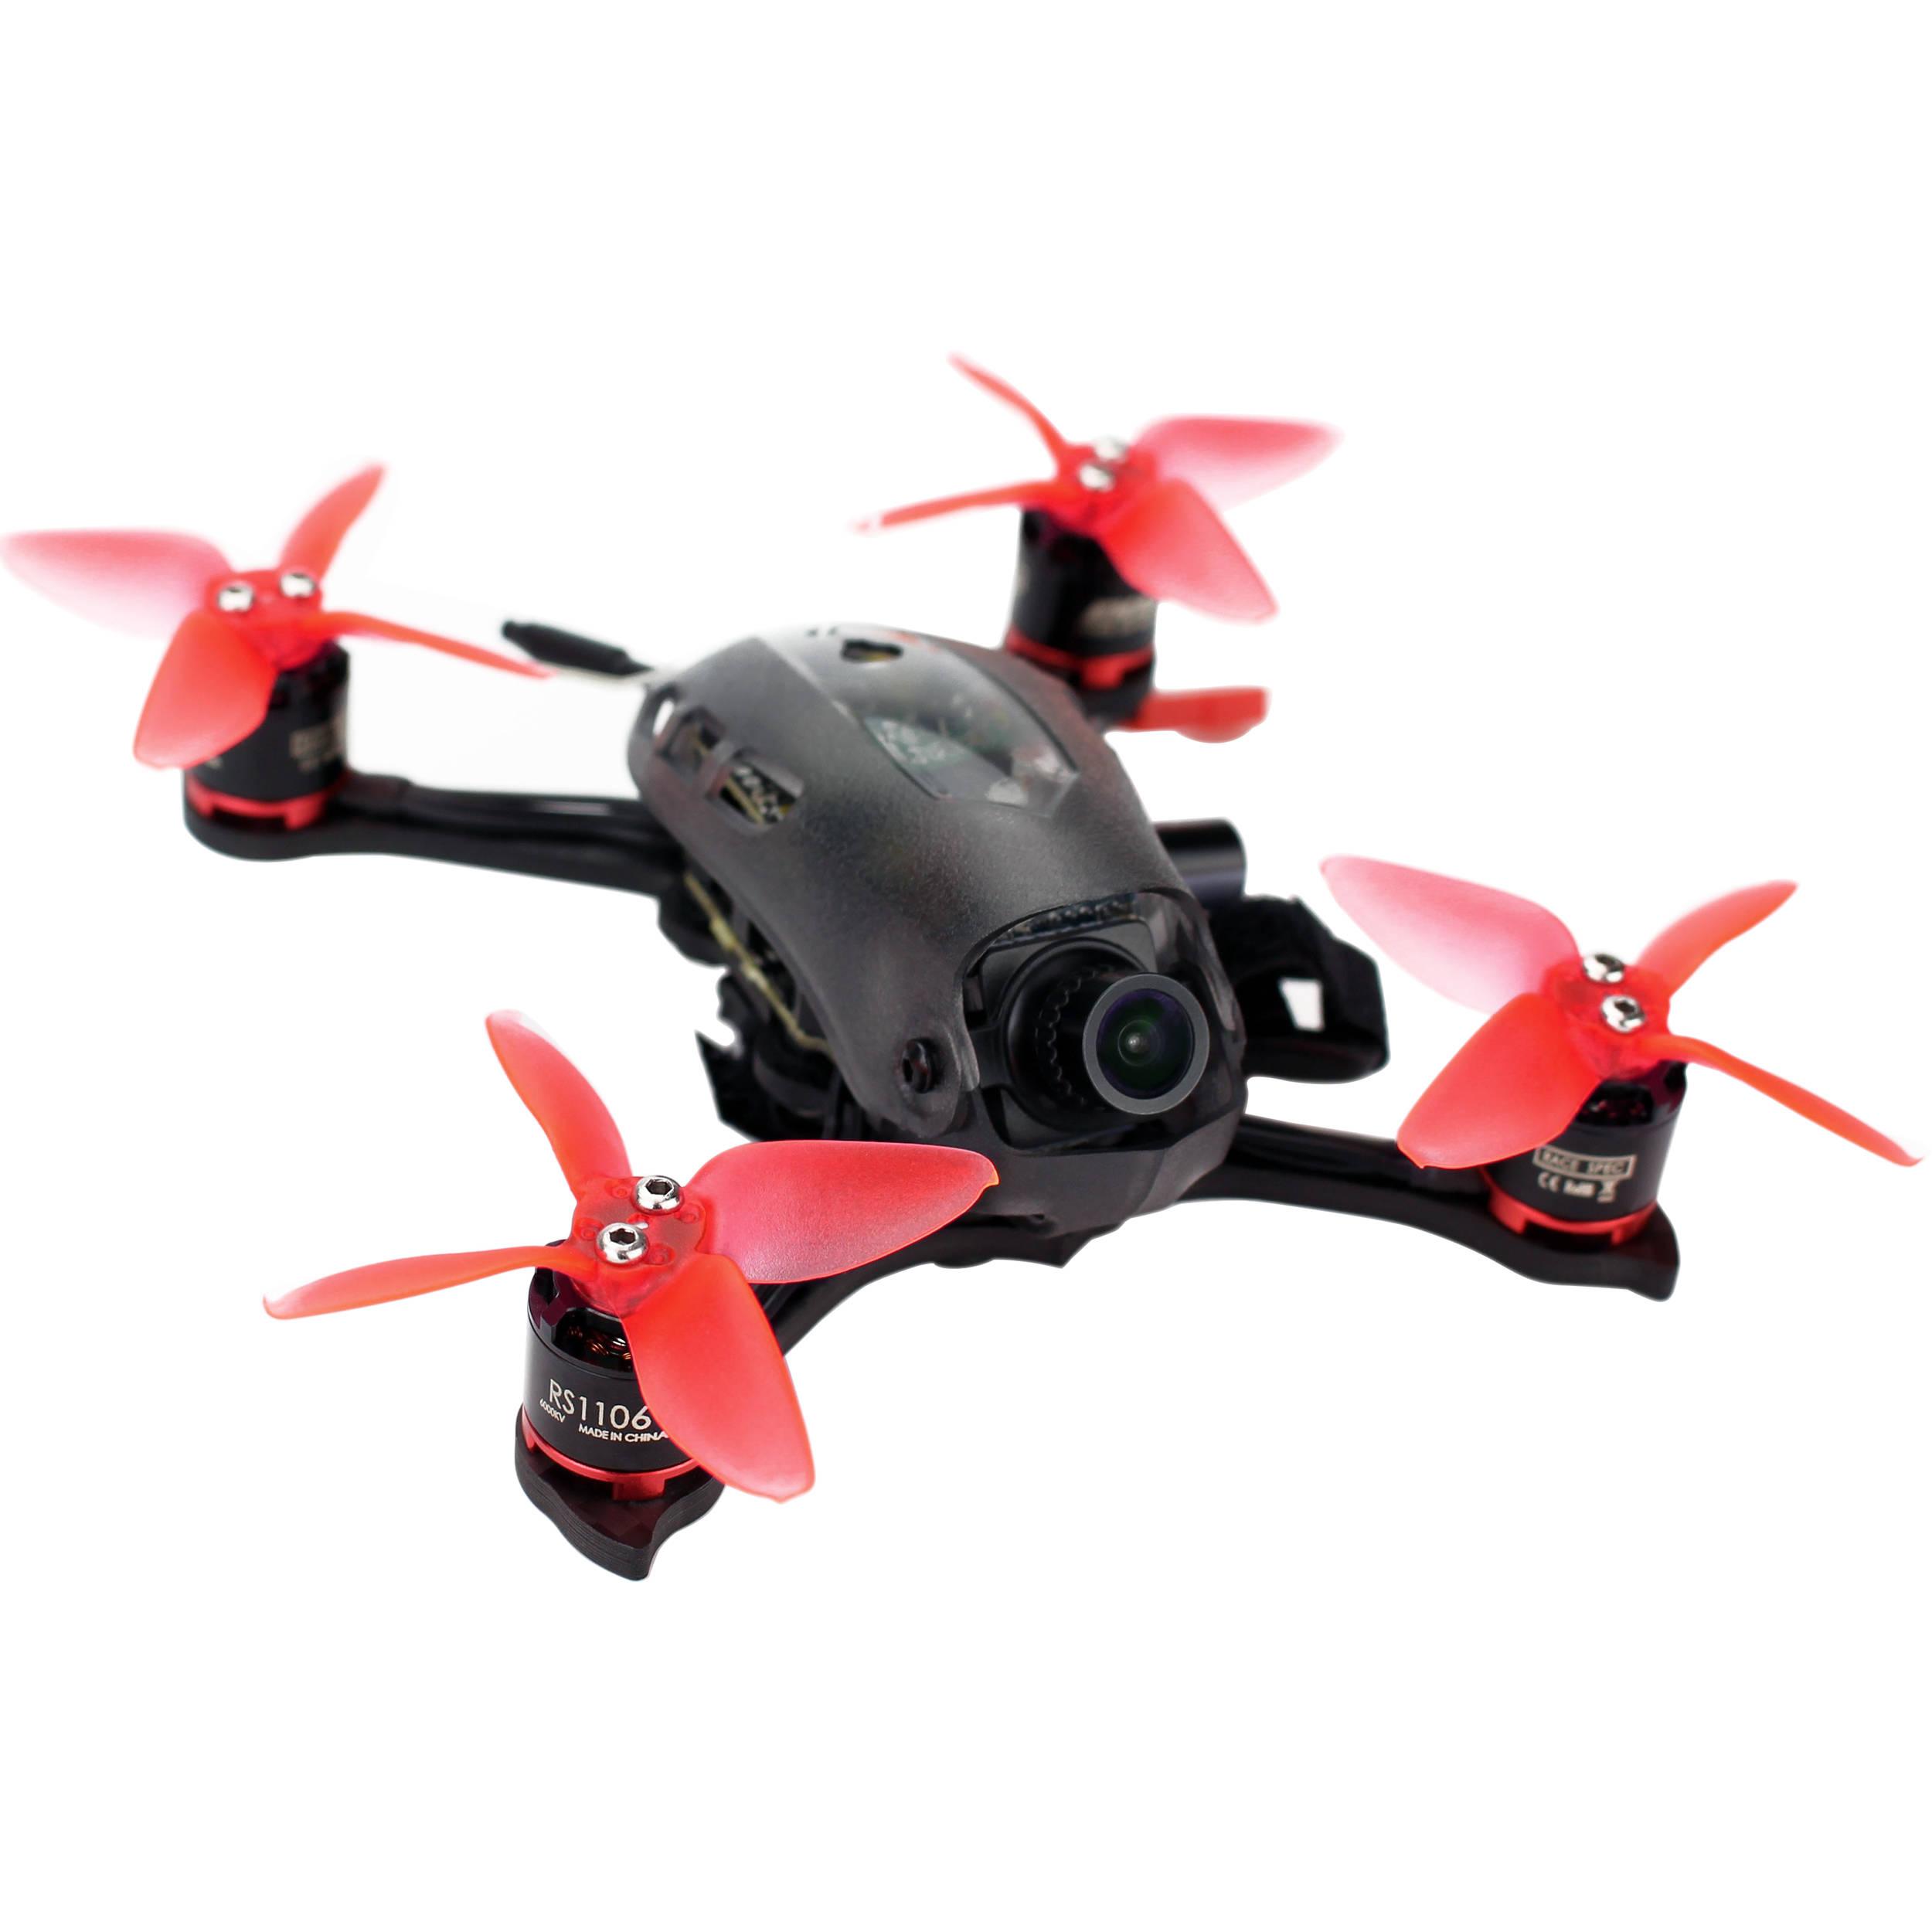 EMAX Babyhawk R Racing Edition FPV Quadcopter (PNP, 2